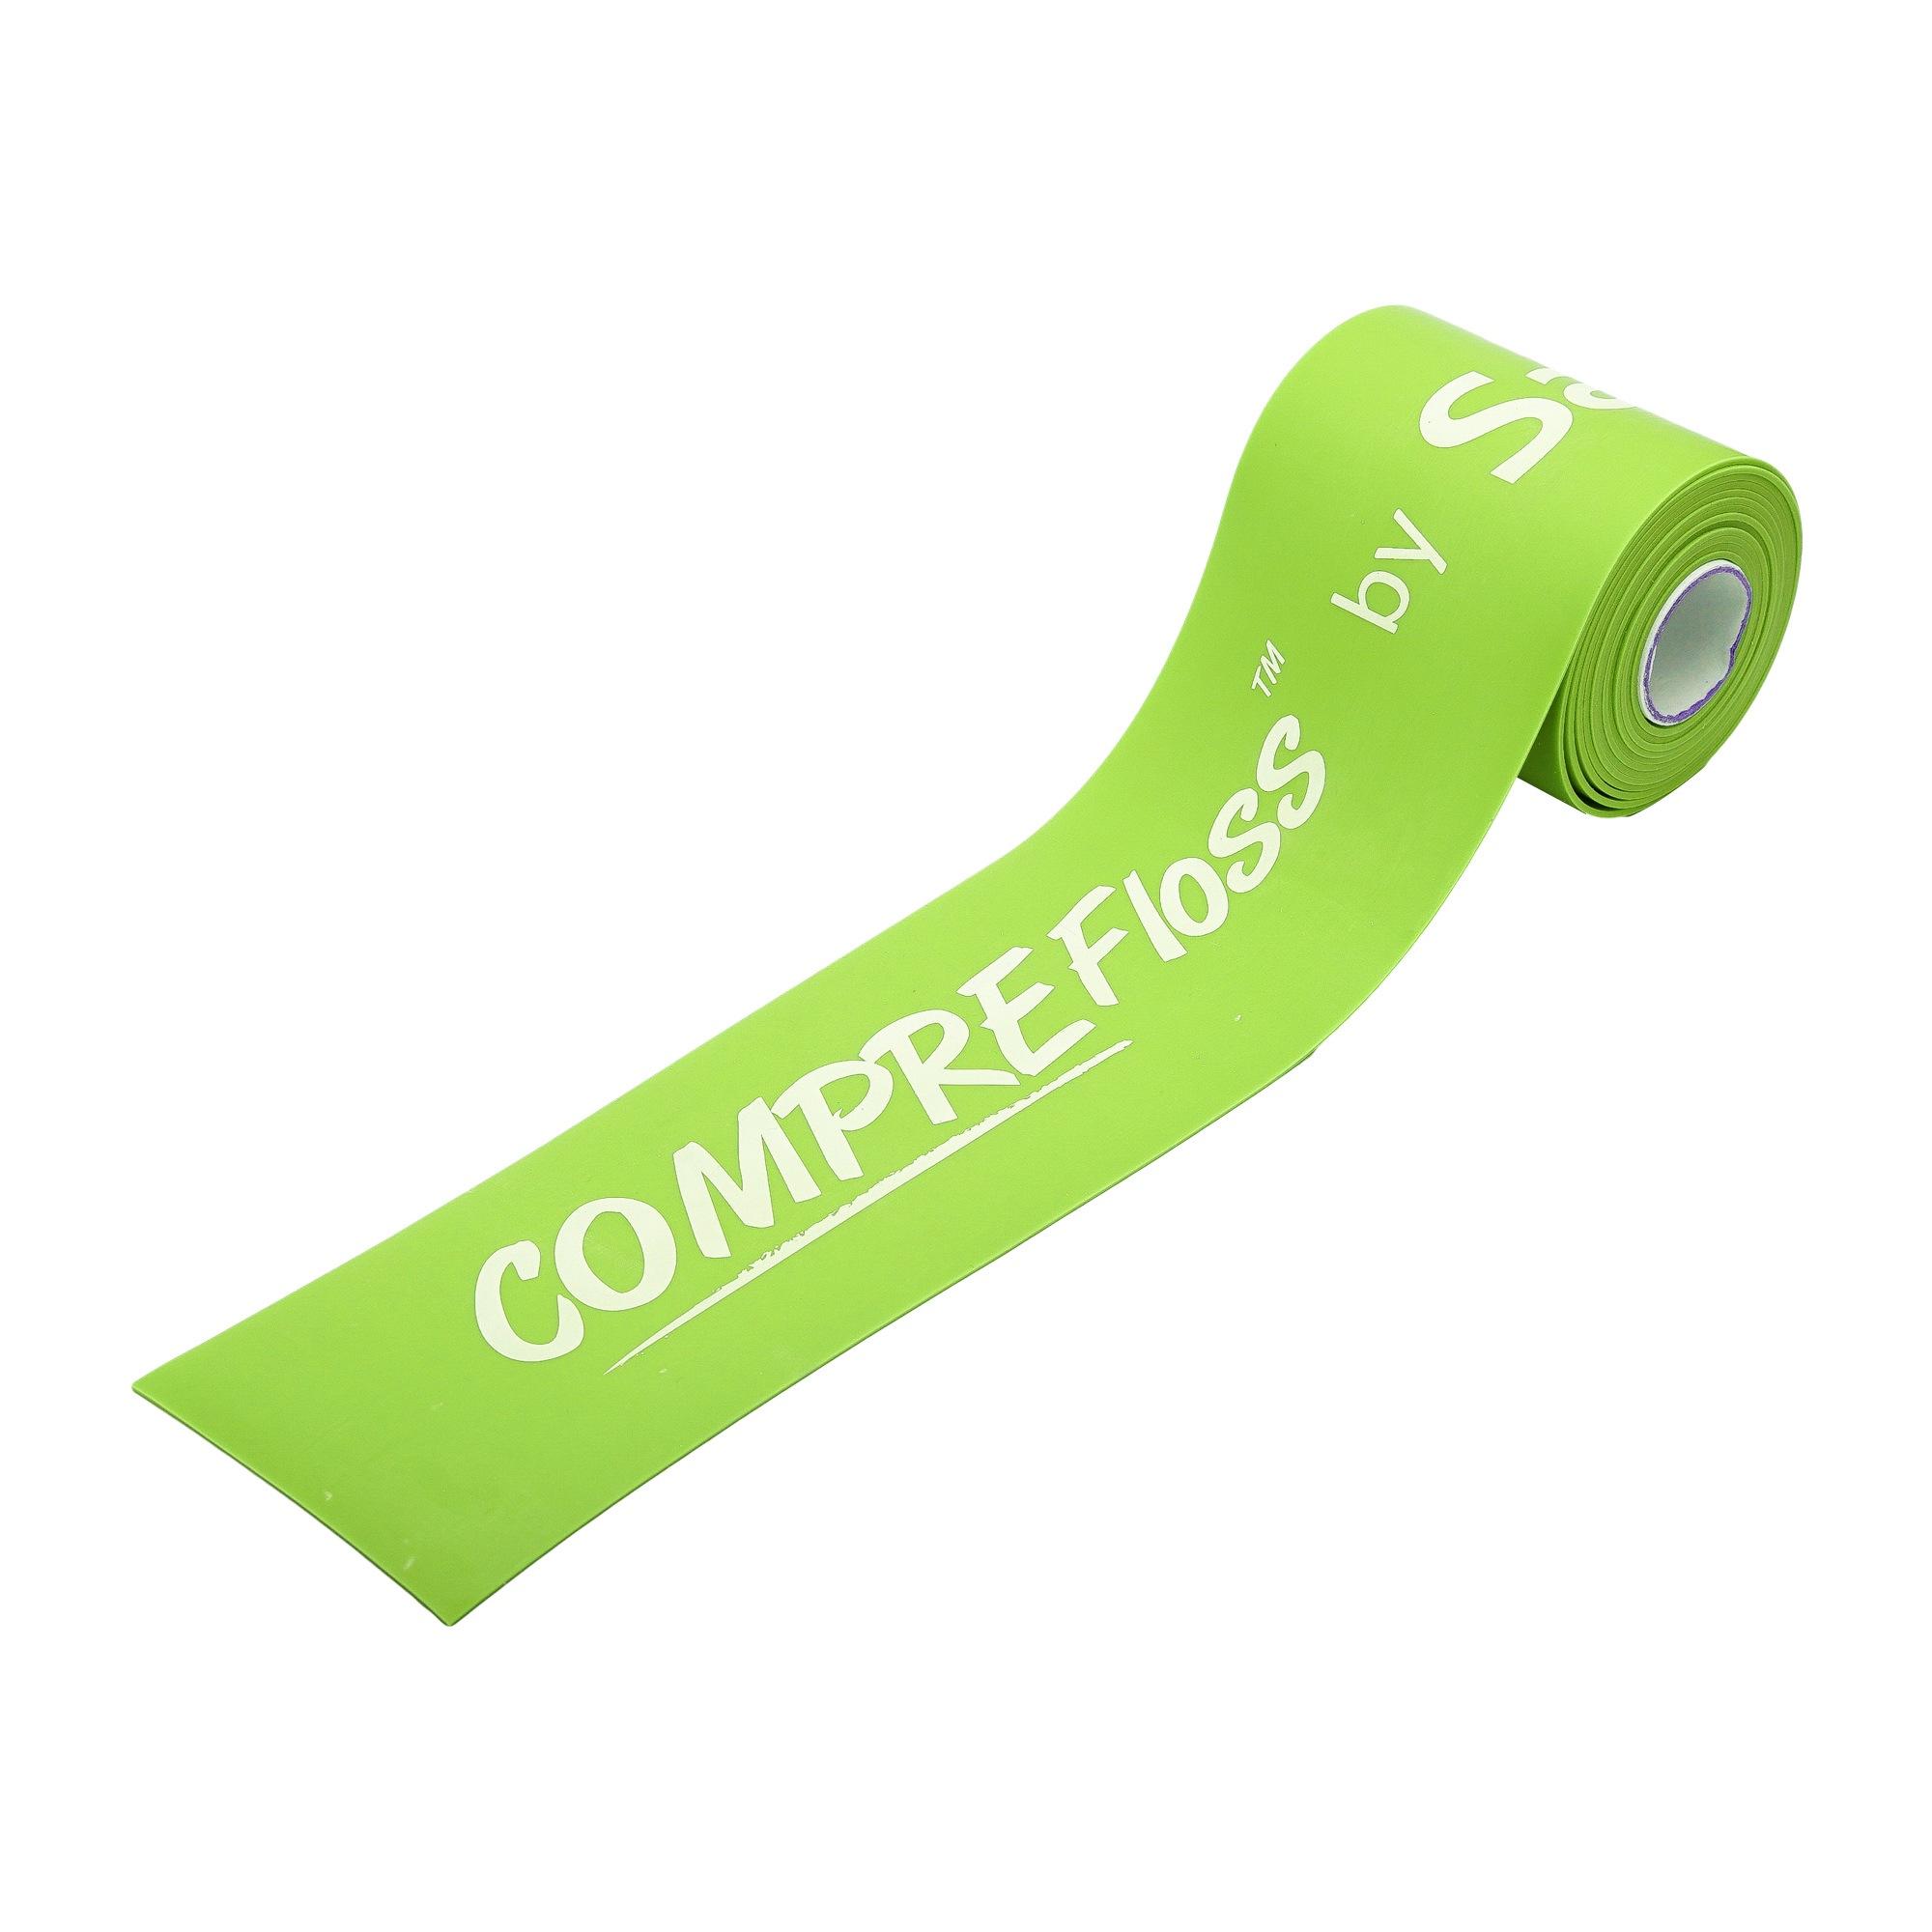 Sanctband Comprefloss Flossband extra breit 7,5cm und extra lang 3,5m Lime limette